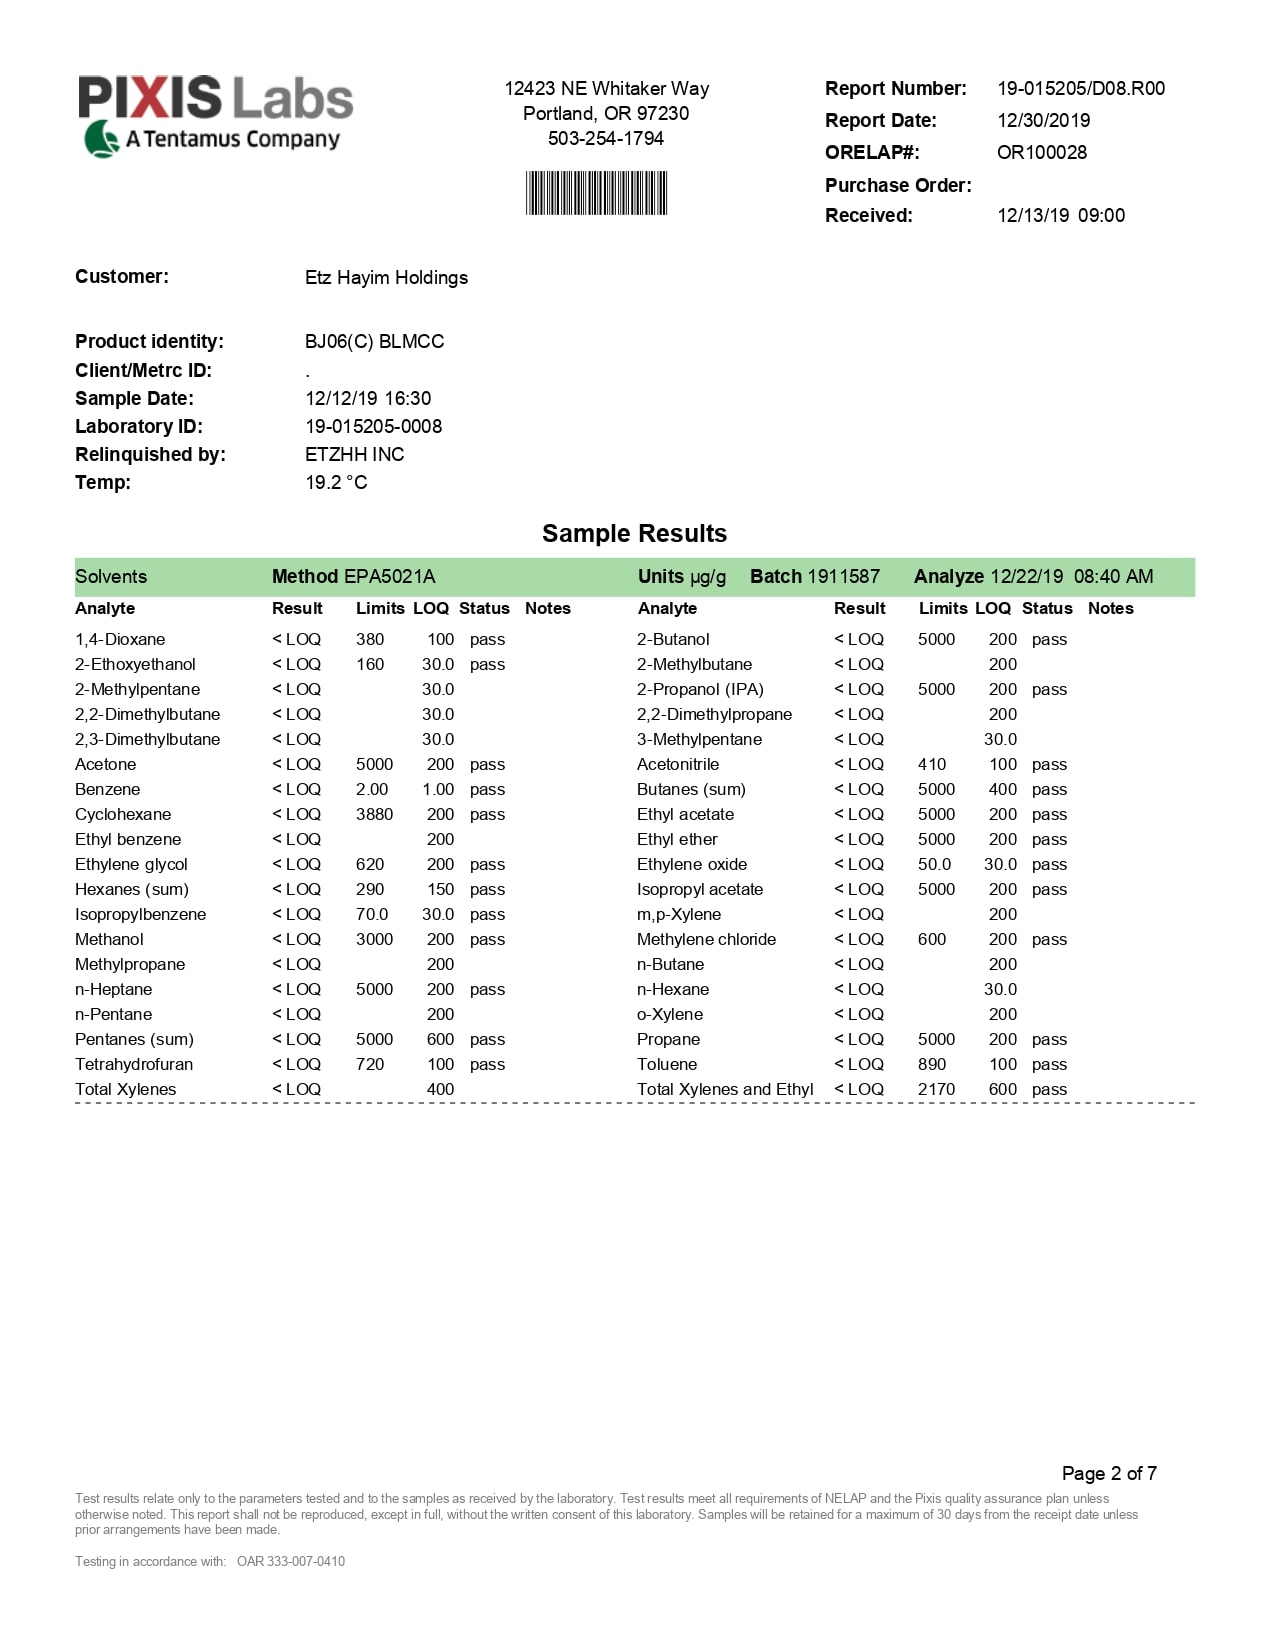 Lazarus Naturals CBD Balm Cedar Citrus Lab Report